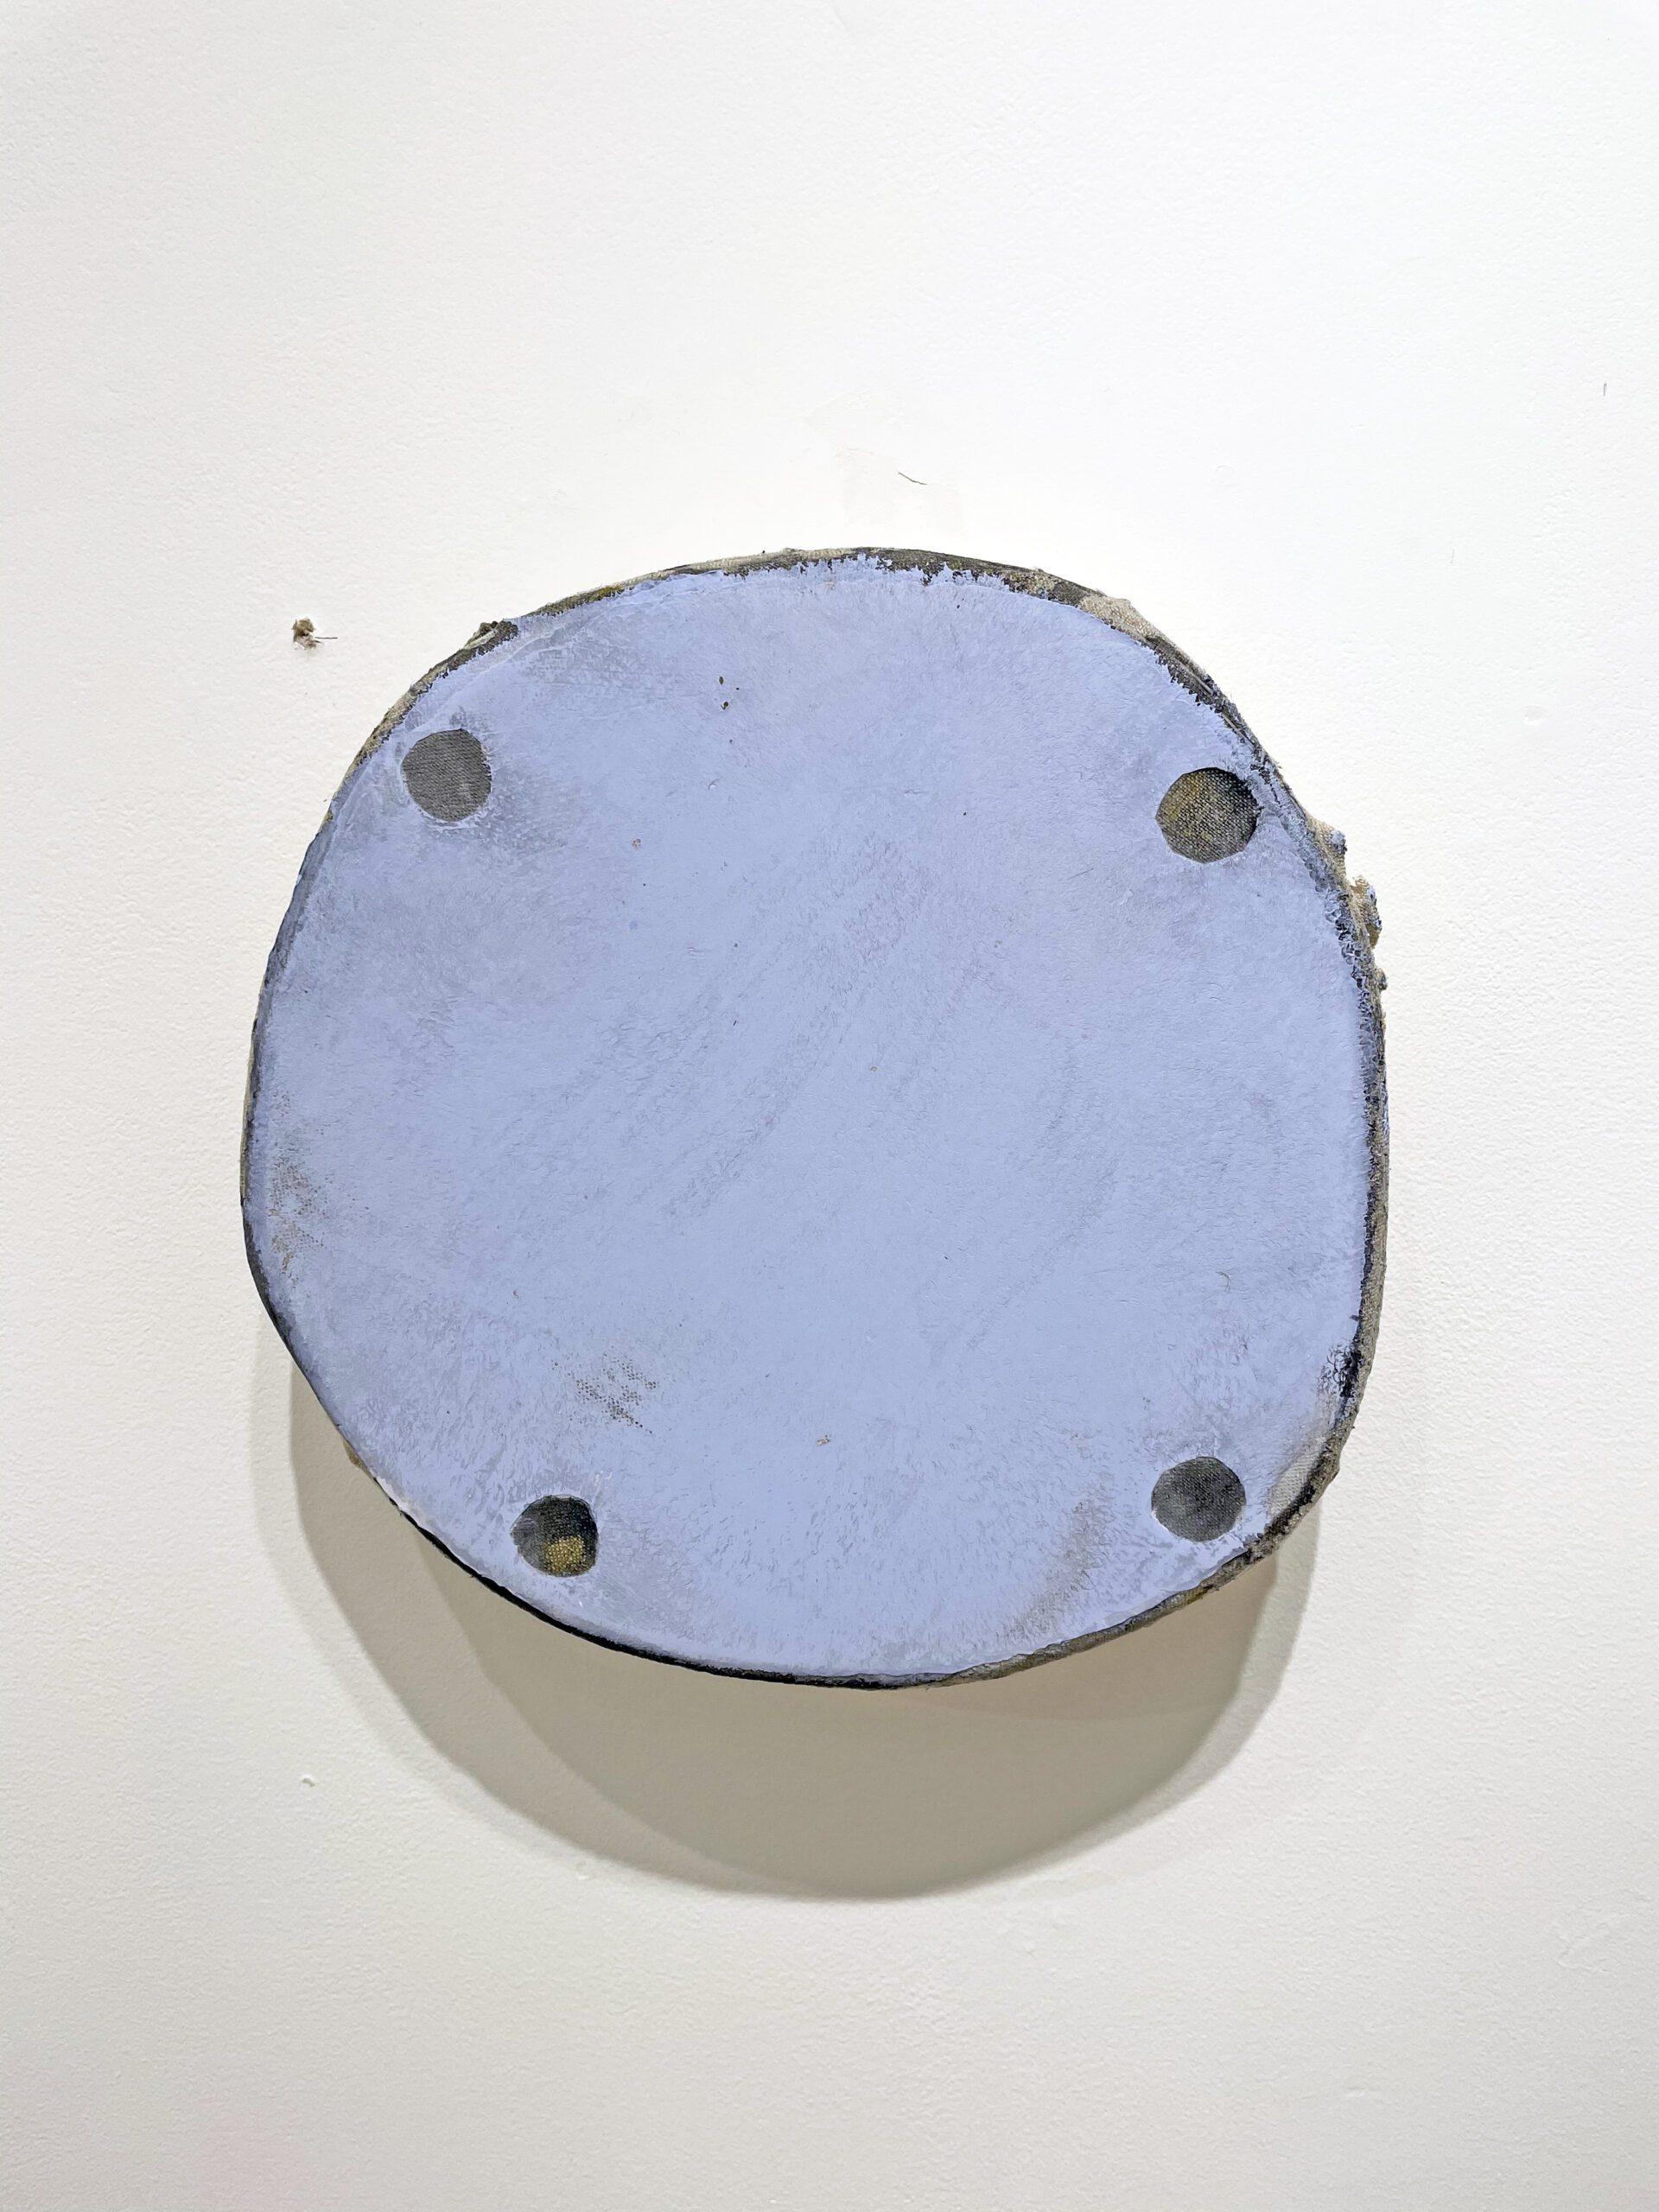 Otis Jones 2021 Acrylic on linen 11 x 10.75 x 3 inches (27.94 x 27.3 x 7.62 cm) 2021 Marc Straus Gallery